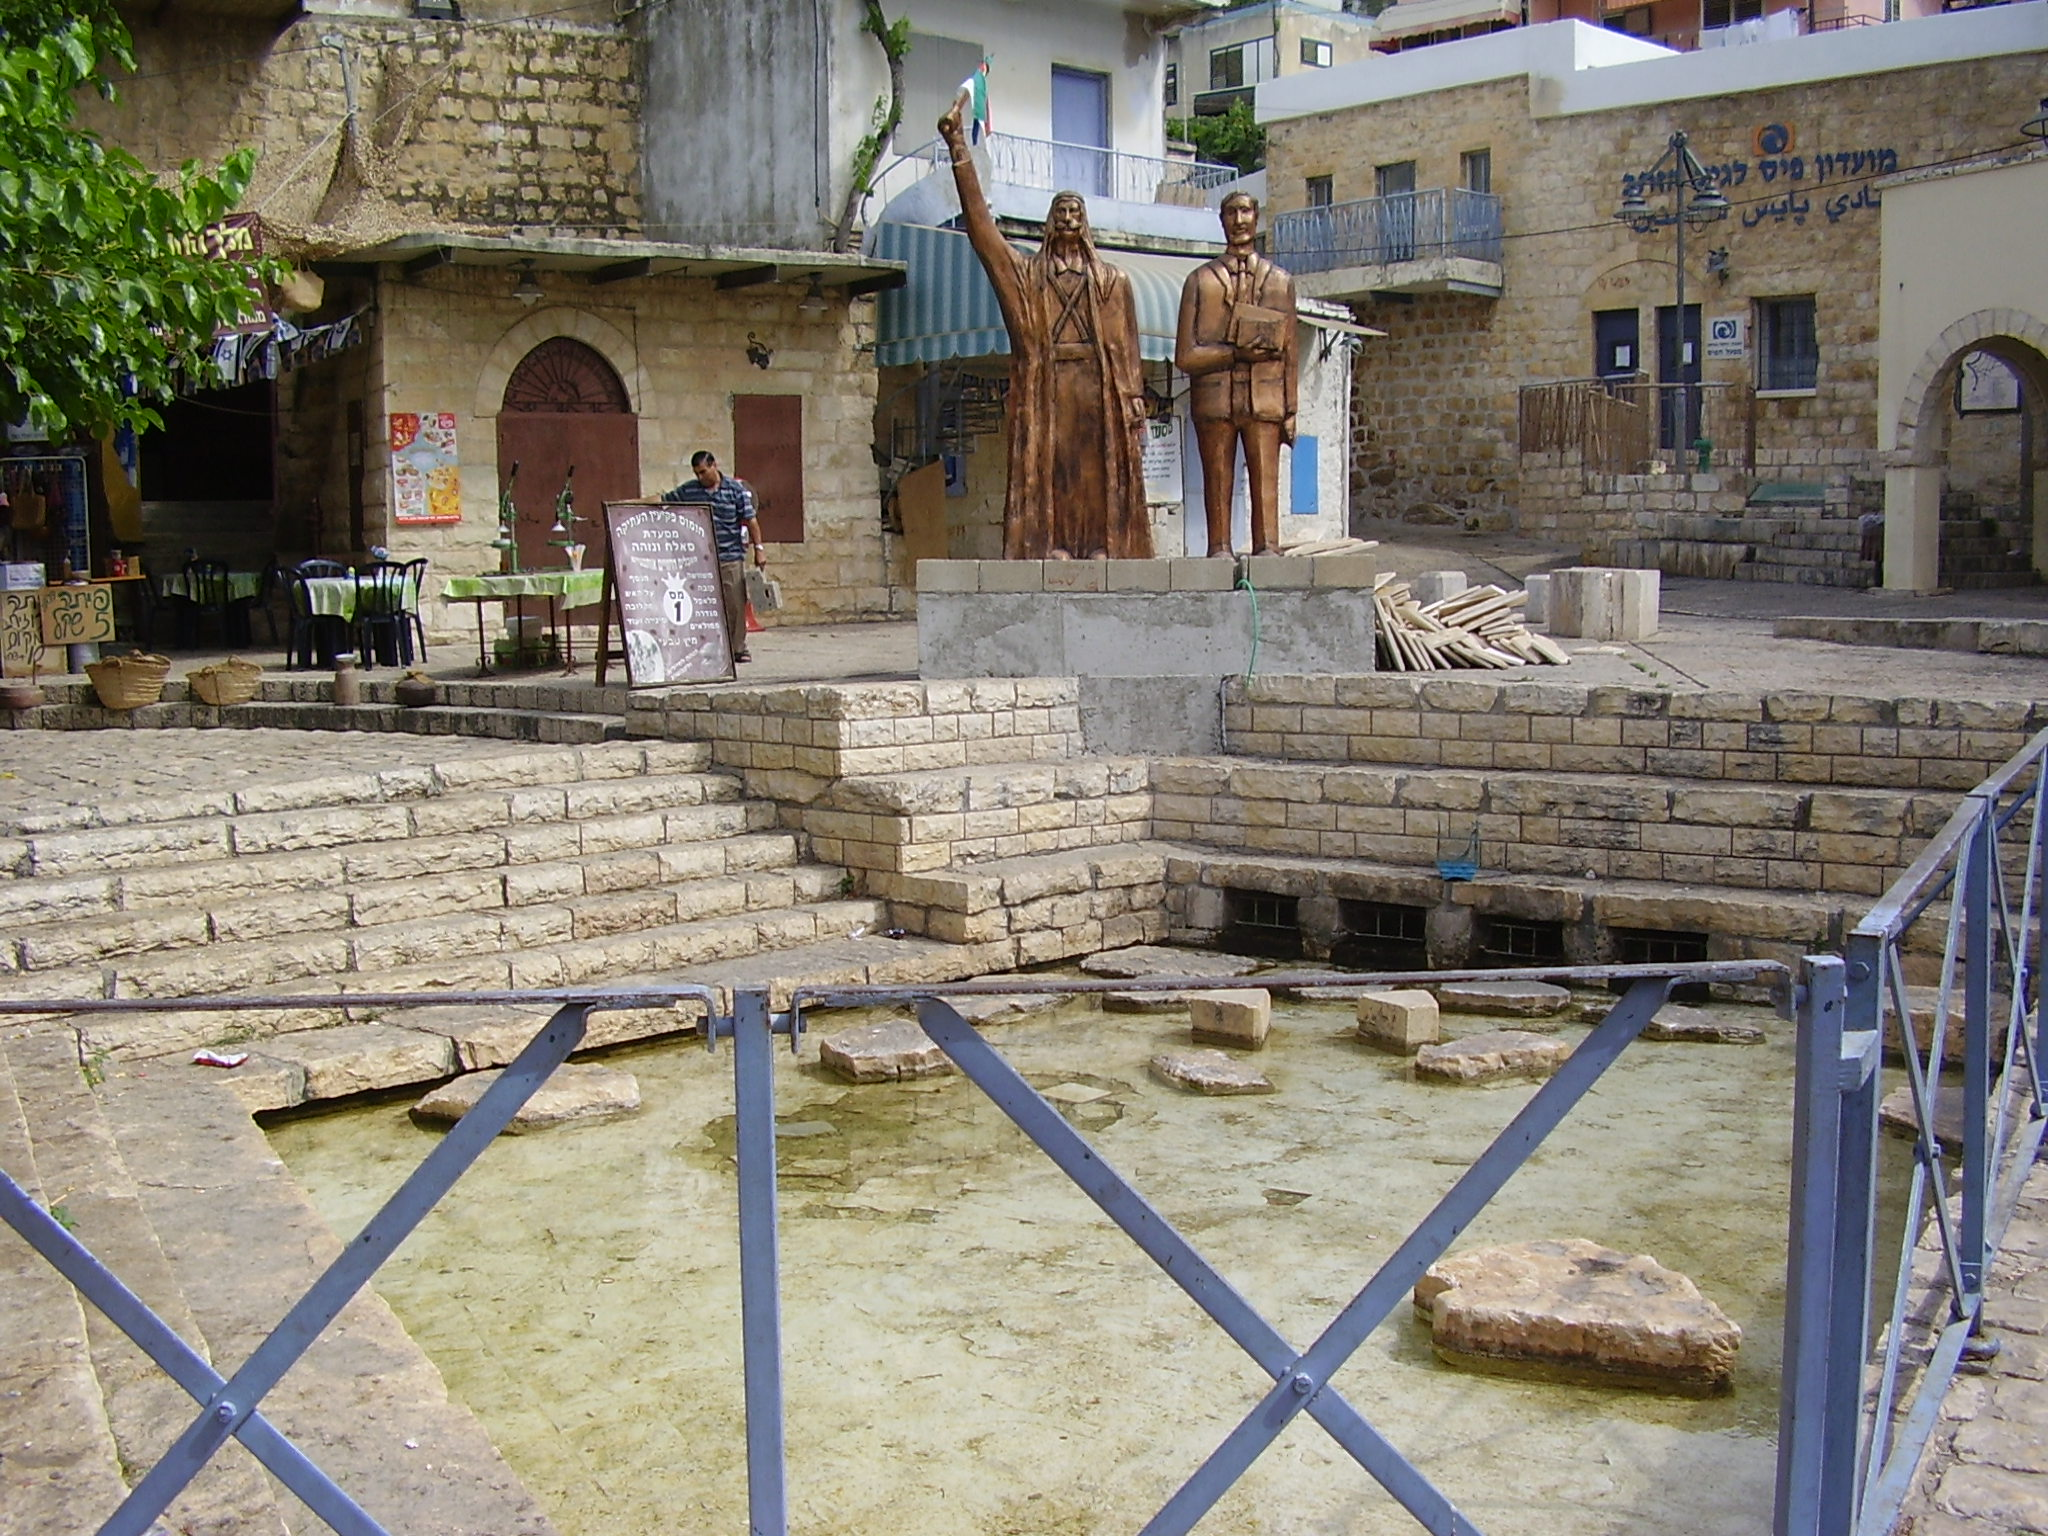 Pekiin Israel  city photos gallery : Google Images